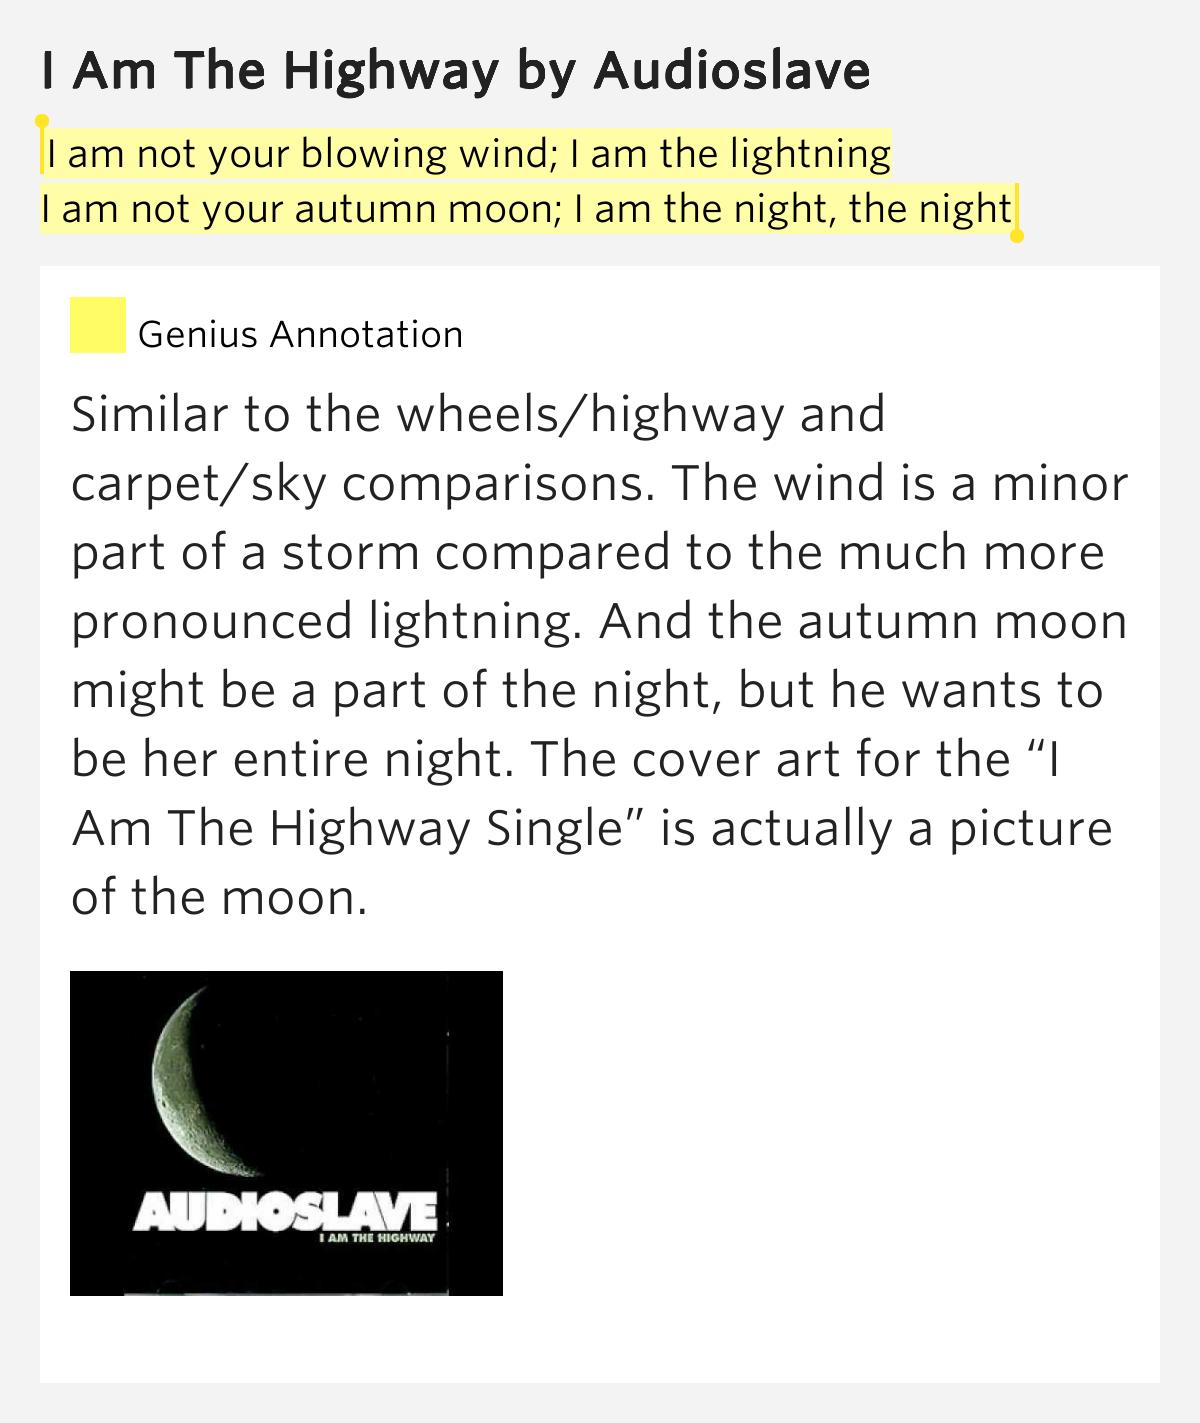 Audioslave - I Am The Highway (Chords) - Ultimate-Guitar.Com